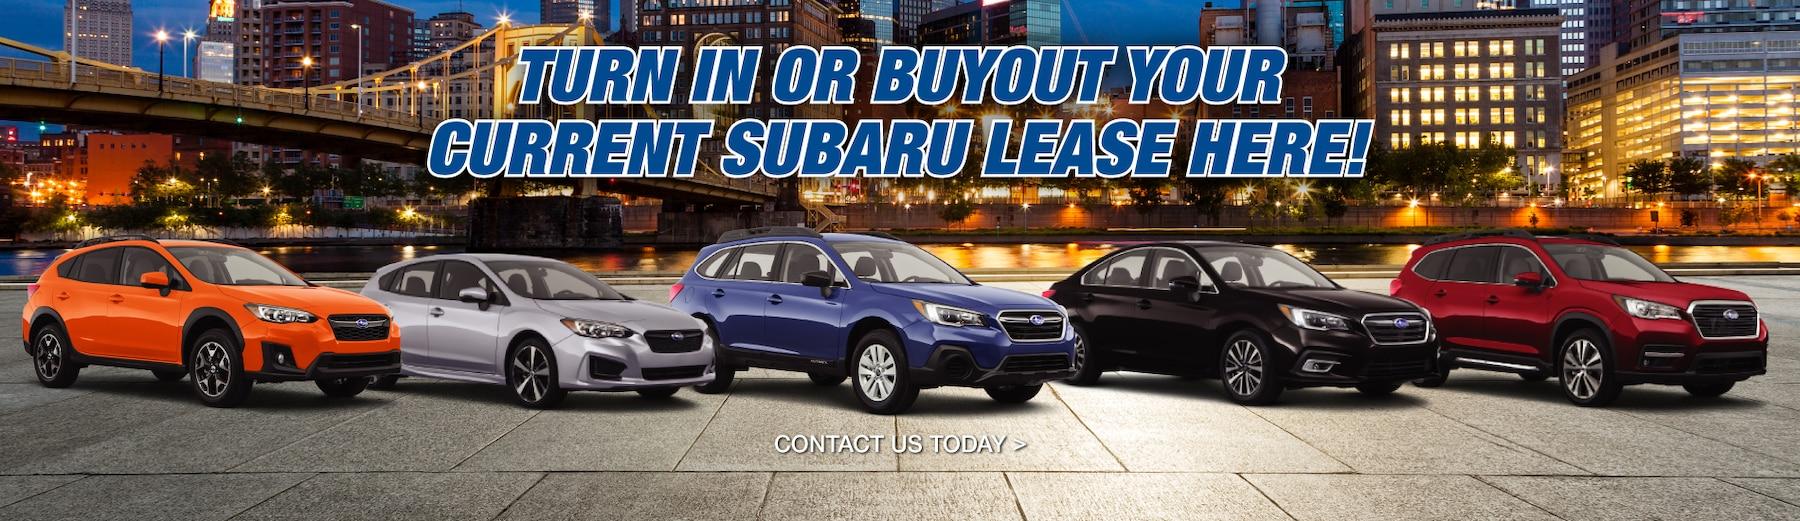 Chase Auto Finance Subaru >> New Subaru Used Cars For Sale In Pittsburgh Subaru Of